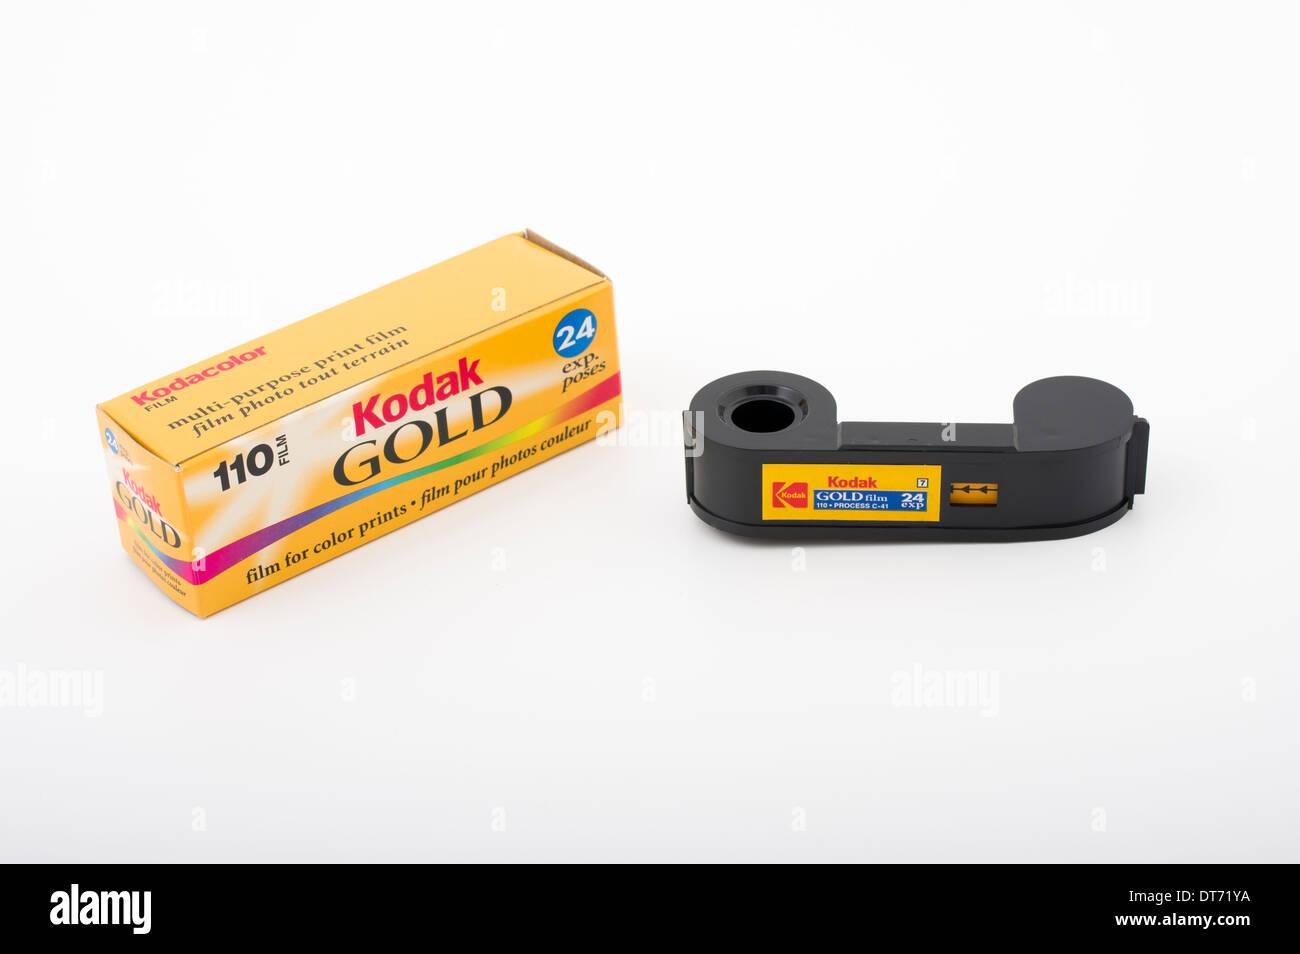 Kodak 110 format film. - Stock Image